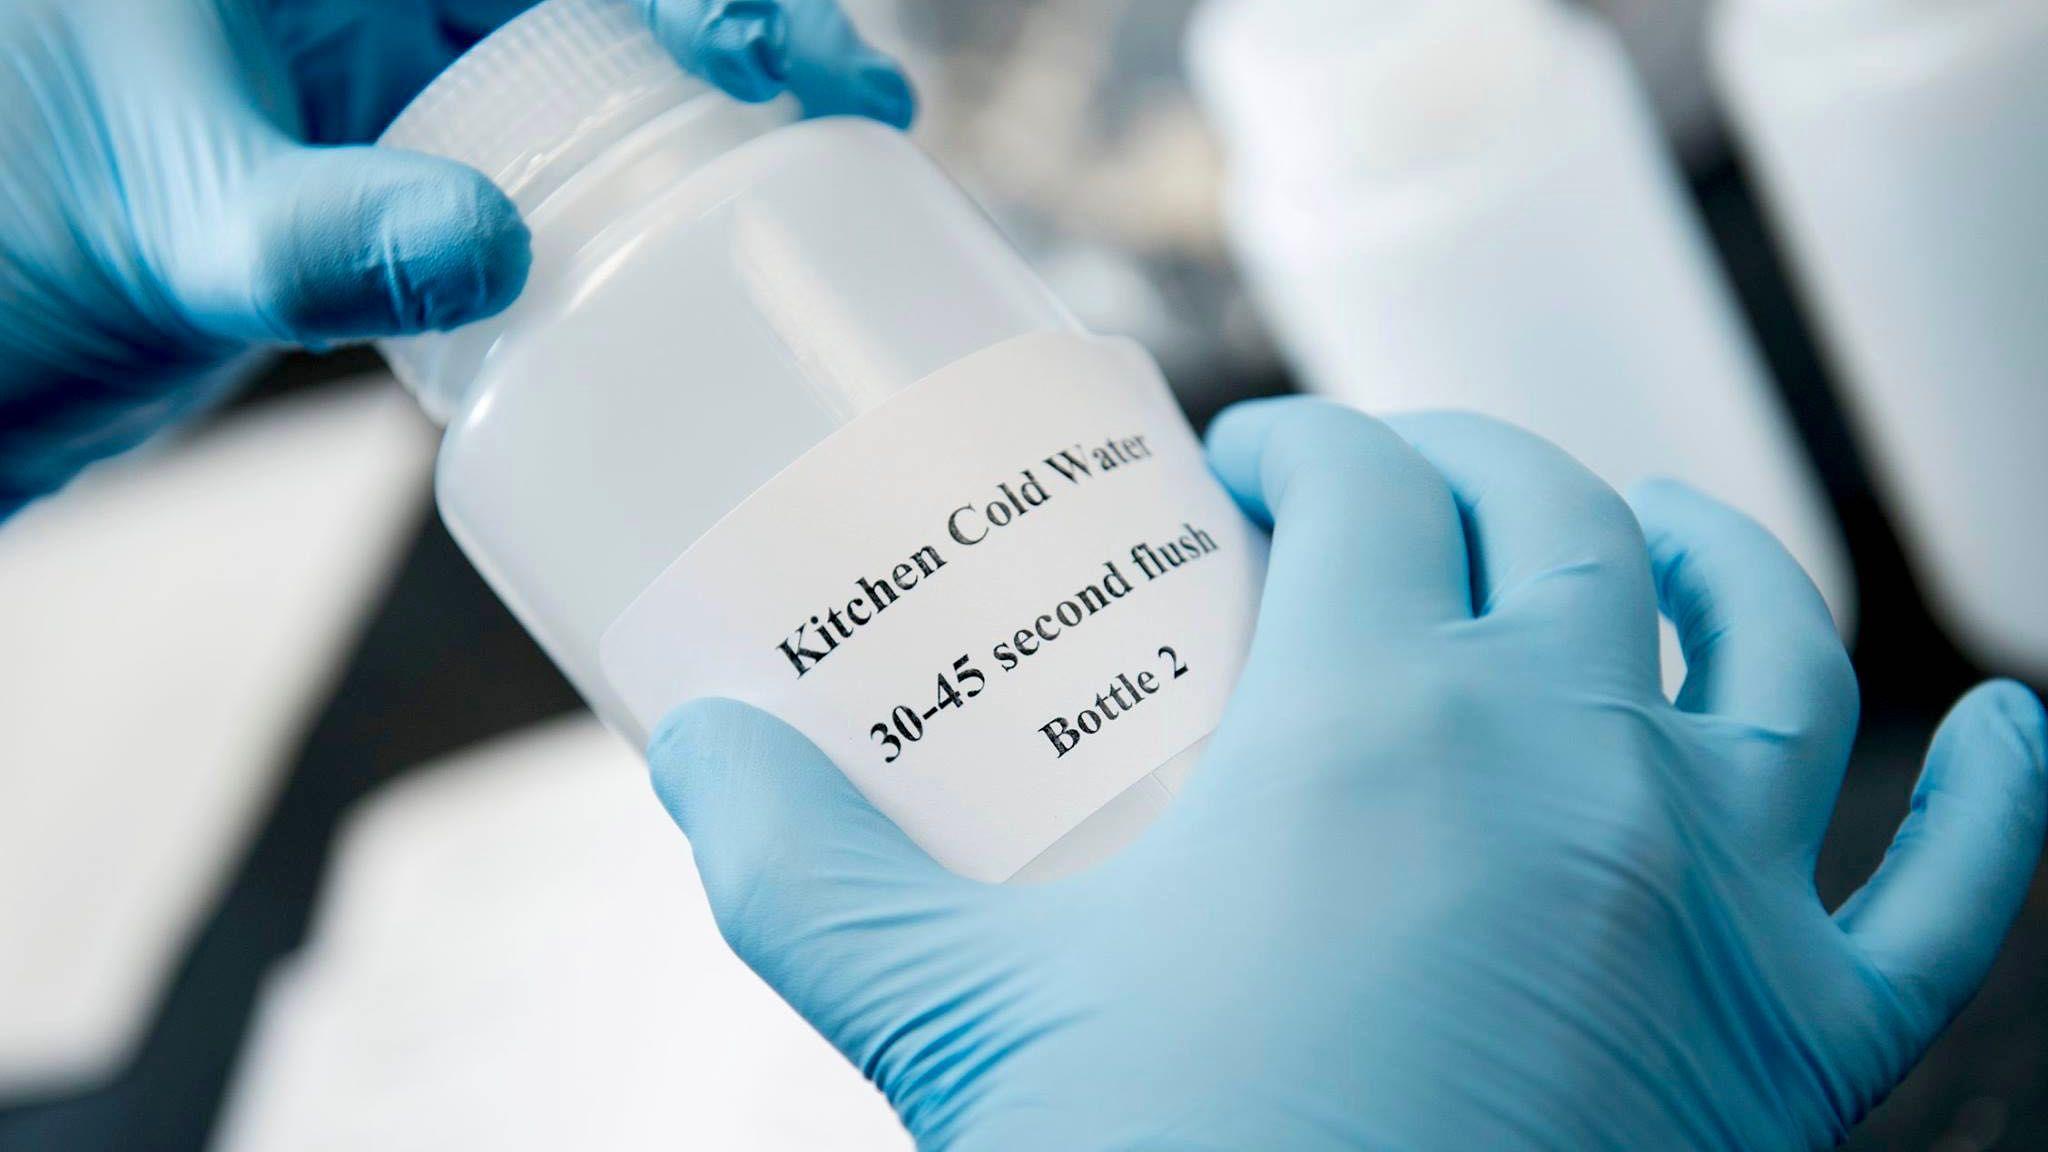 flint-water-sample